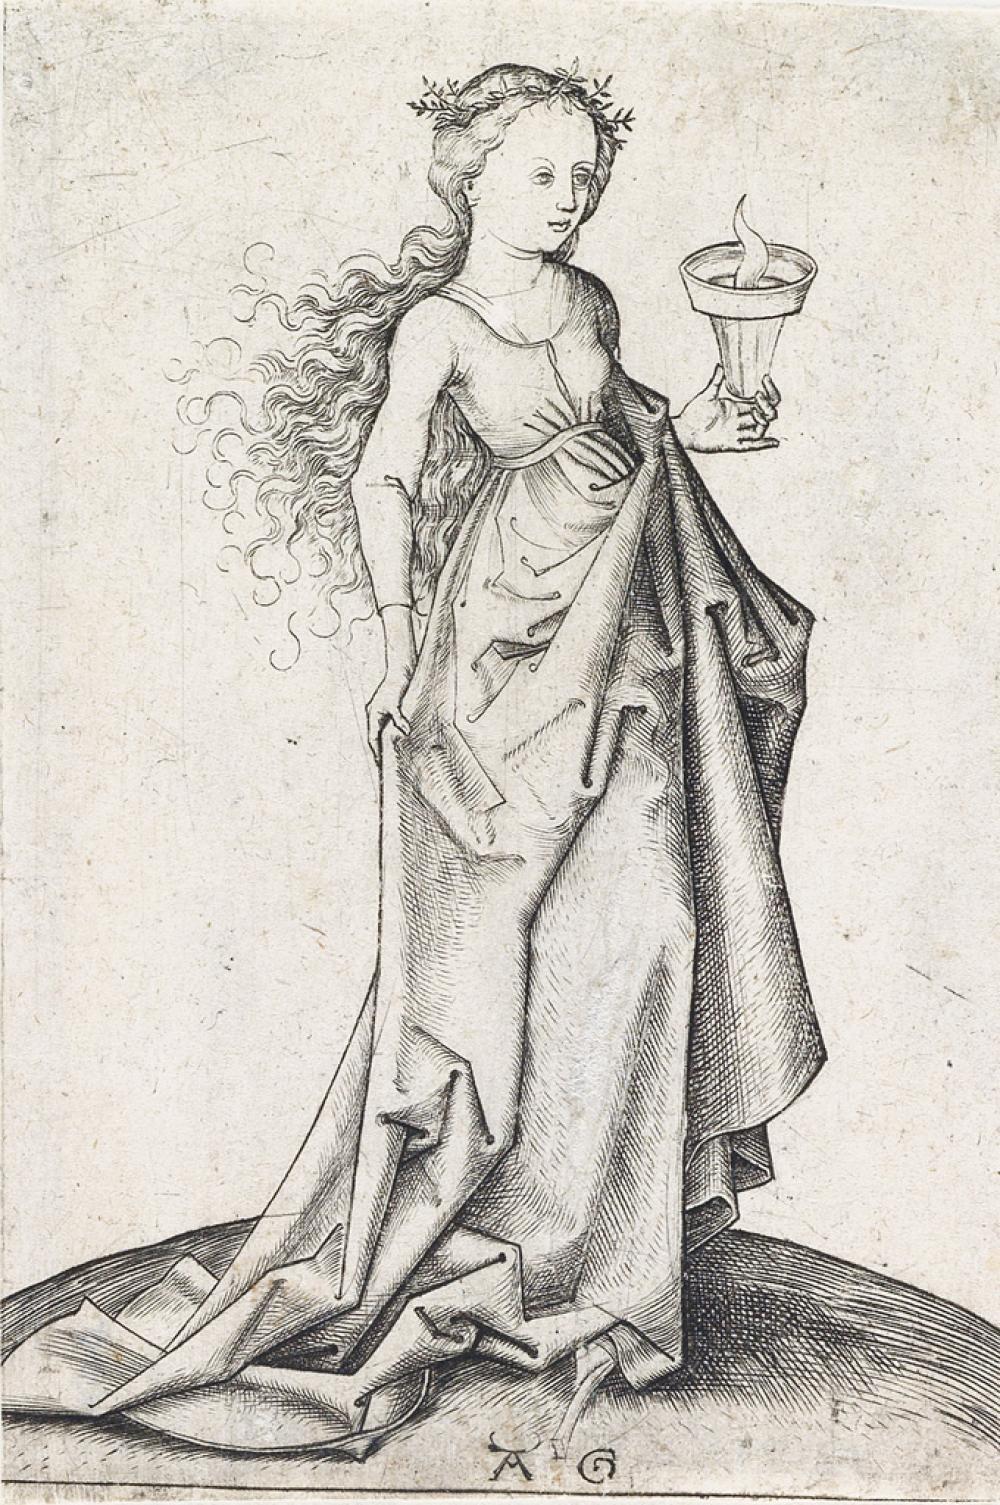 MASTER AG (ALBRECHT GLOCKENDON) (after Schongauer) The Second Wise Virgin